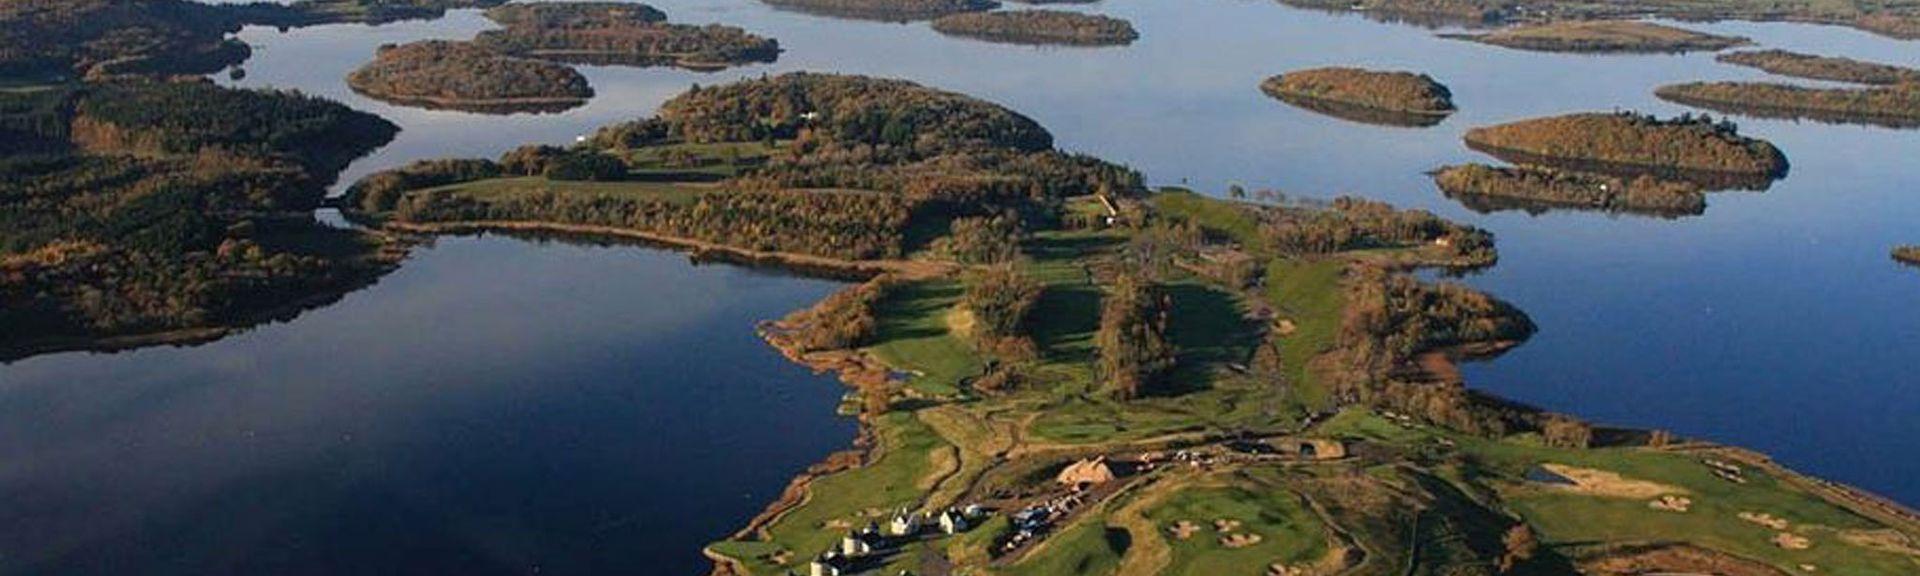 Club de golf Fintona, Omagh, Irlande du Nord, Royaume-Uni